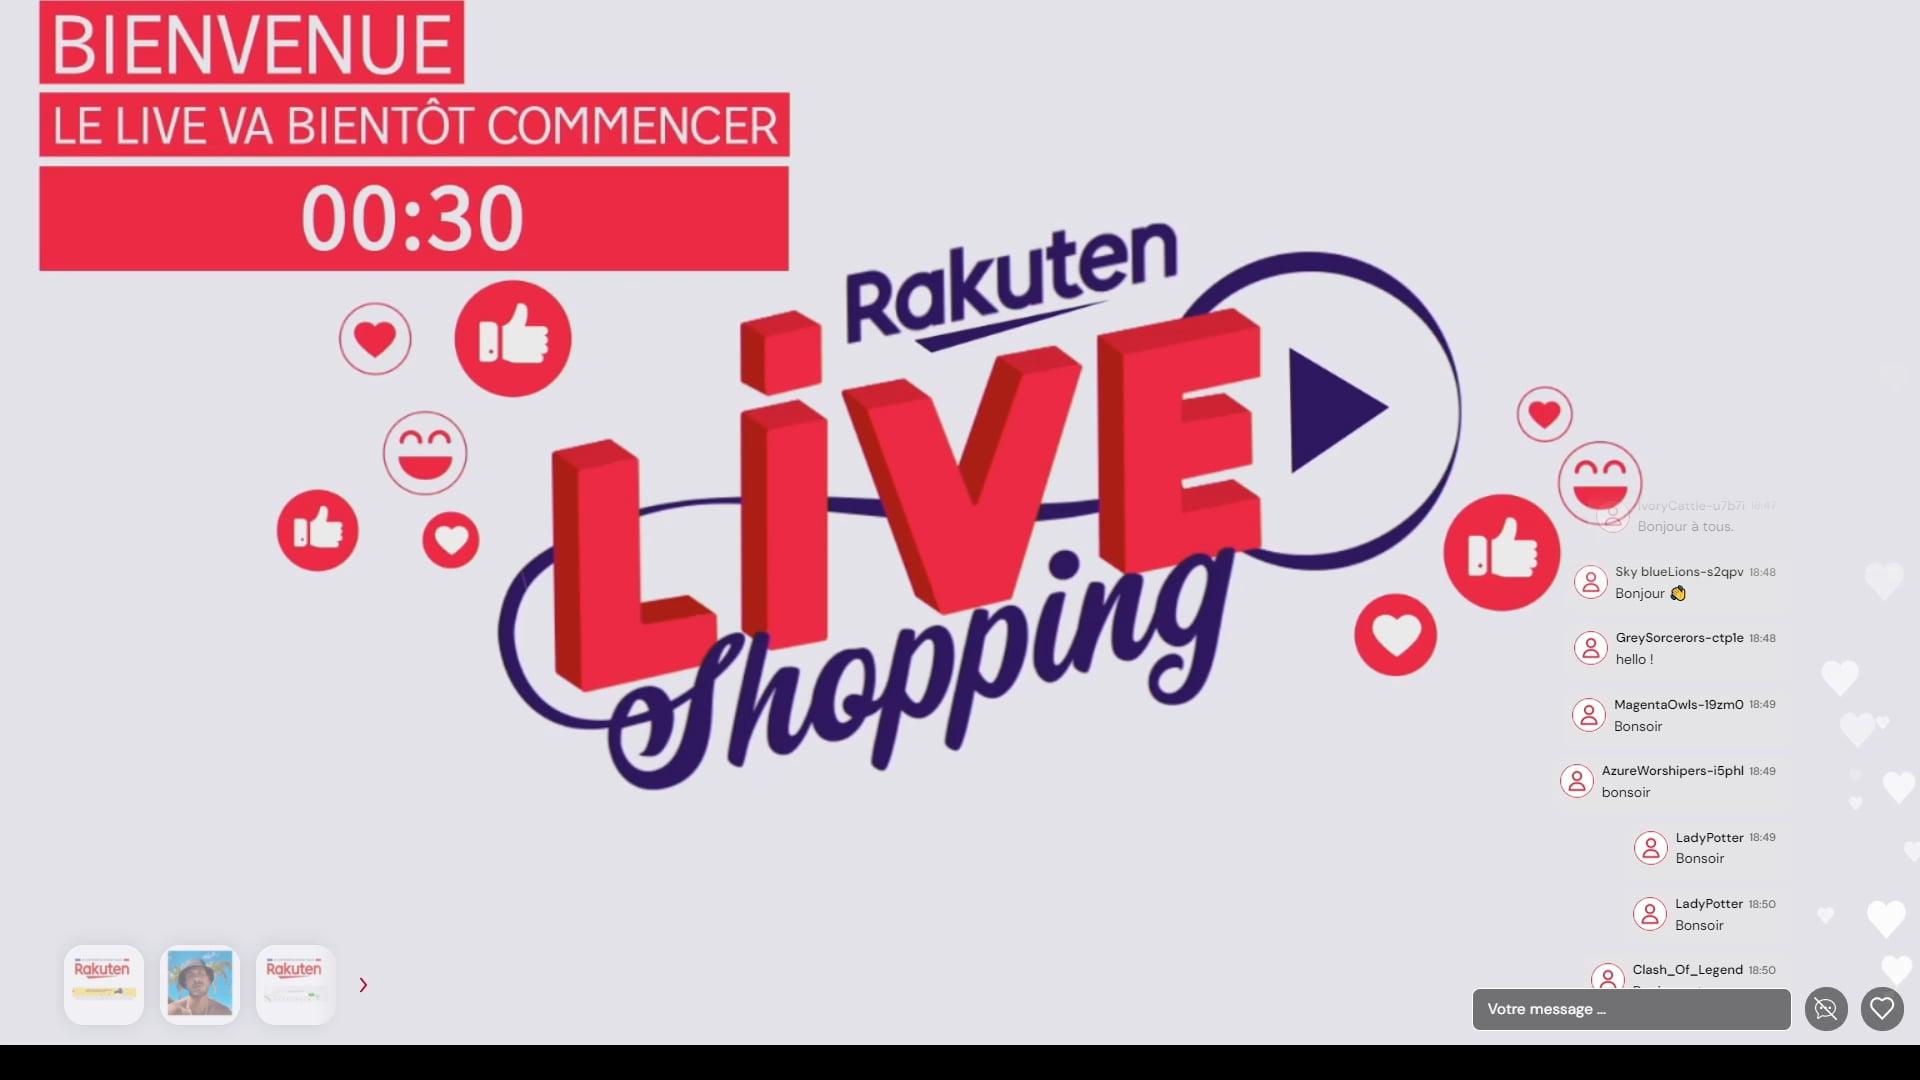 [Replay] - Live spécial seconde main - Rakuten - 29 juin 2021